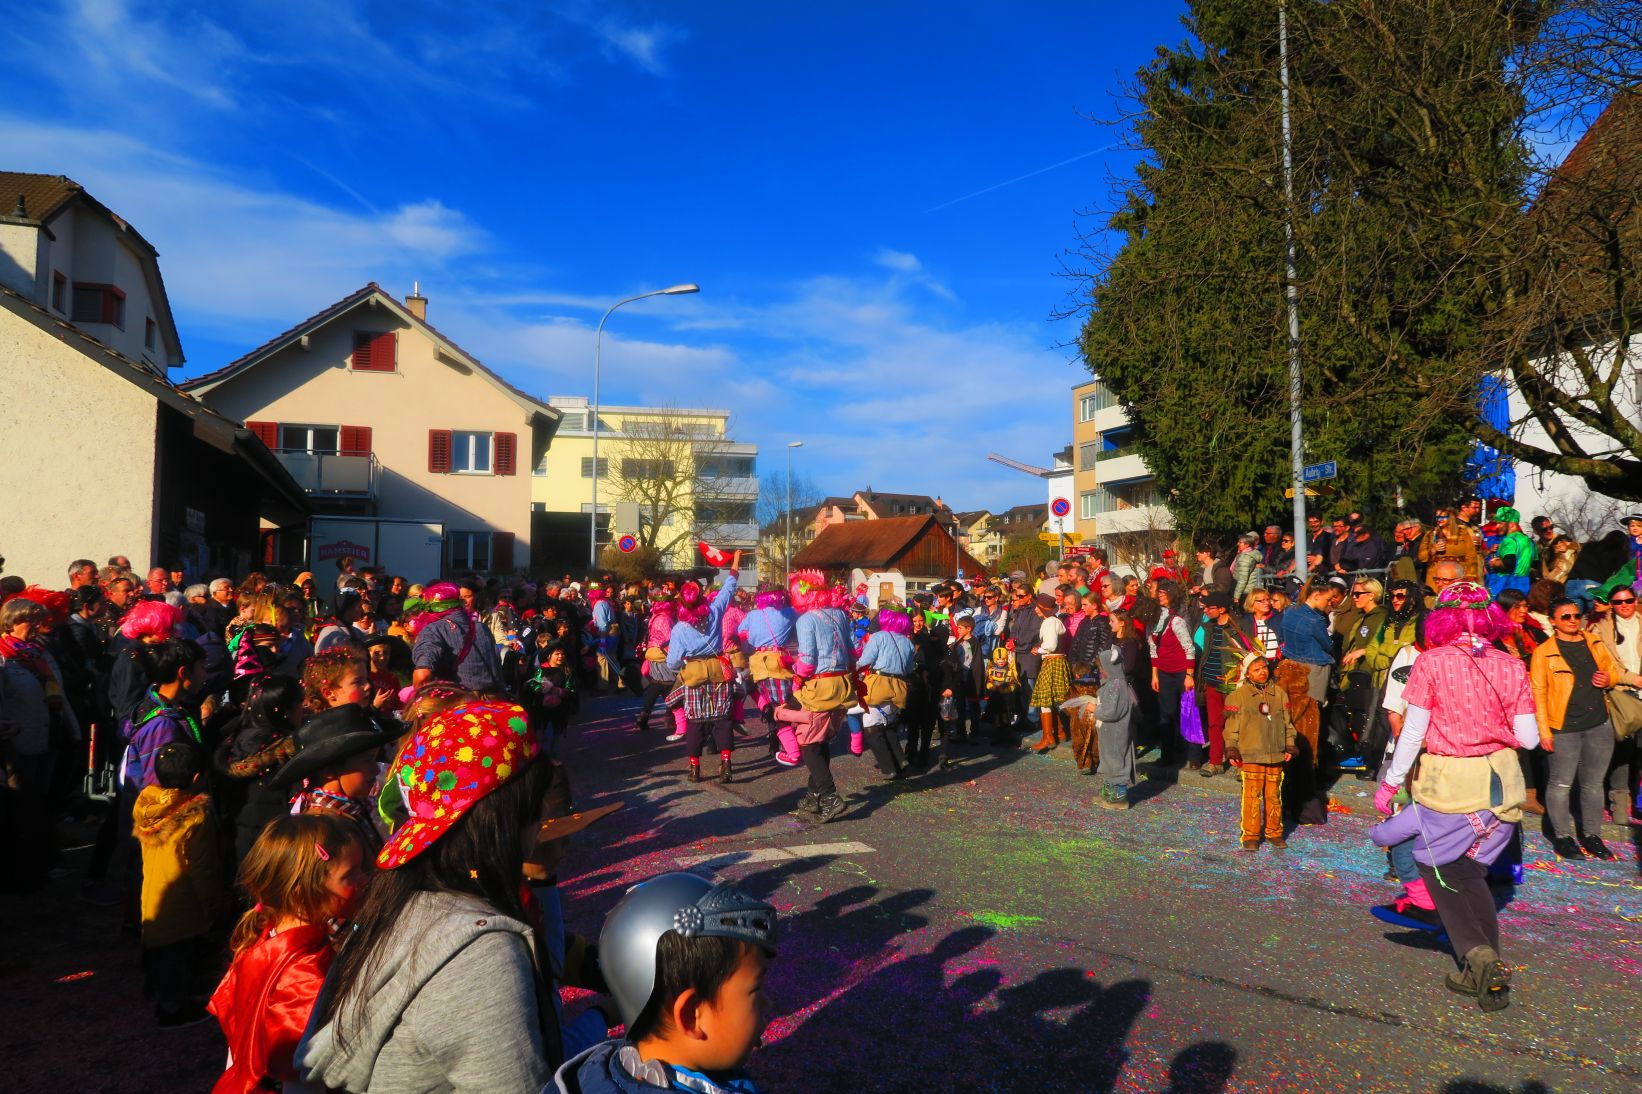 TSVJ-SF-2017-02-23-Fasnacht-Mexikaner-IMG-CE-0127